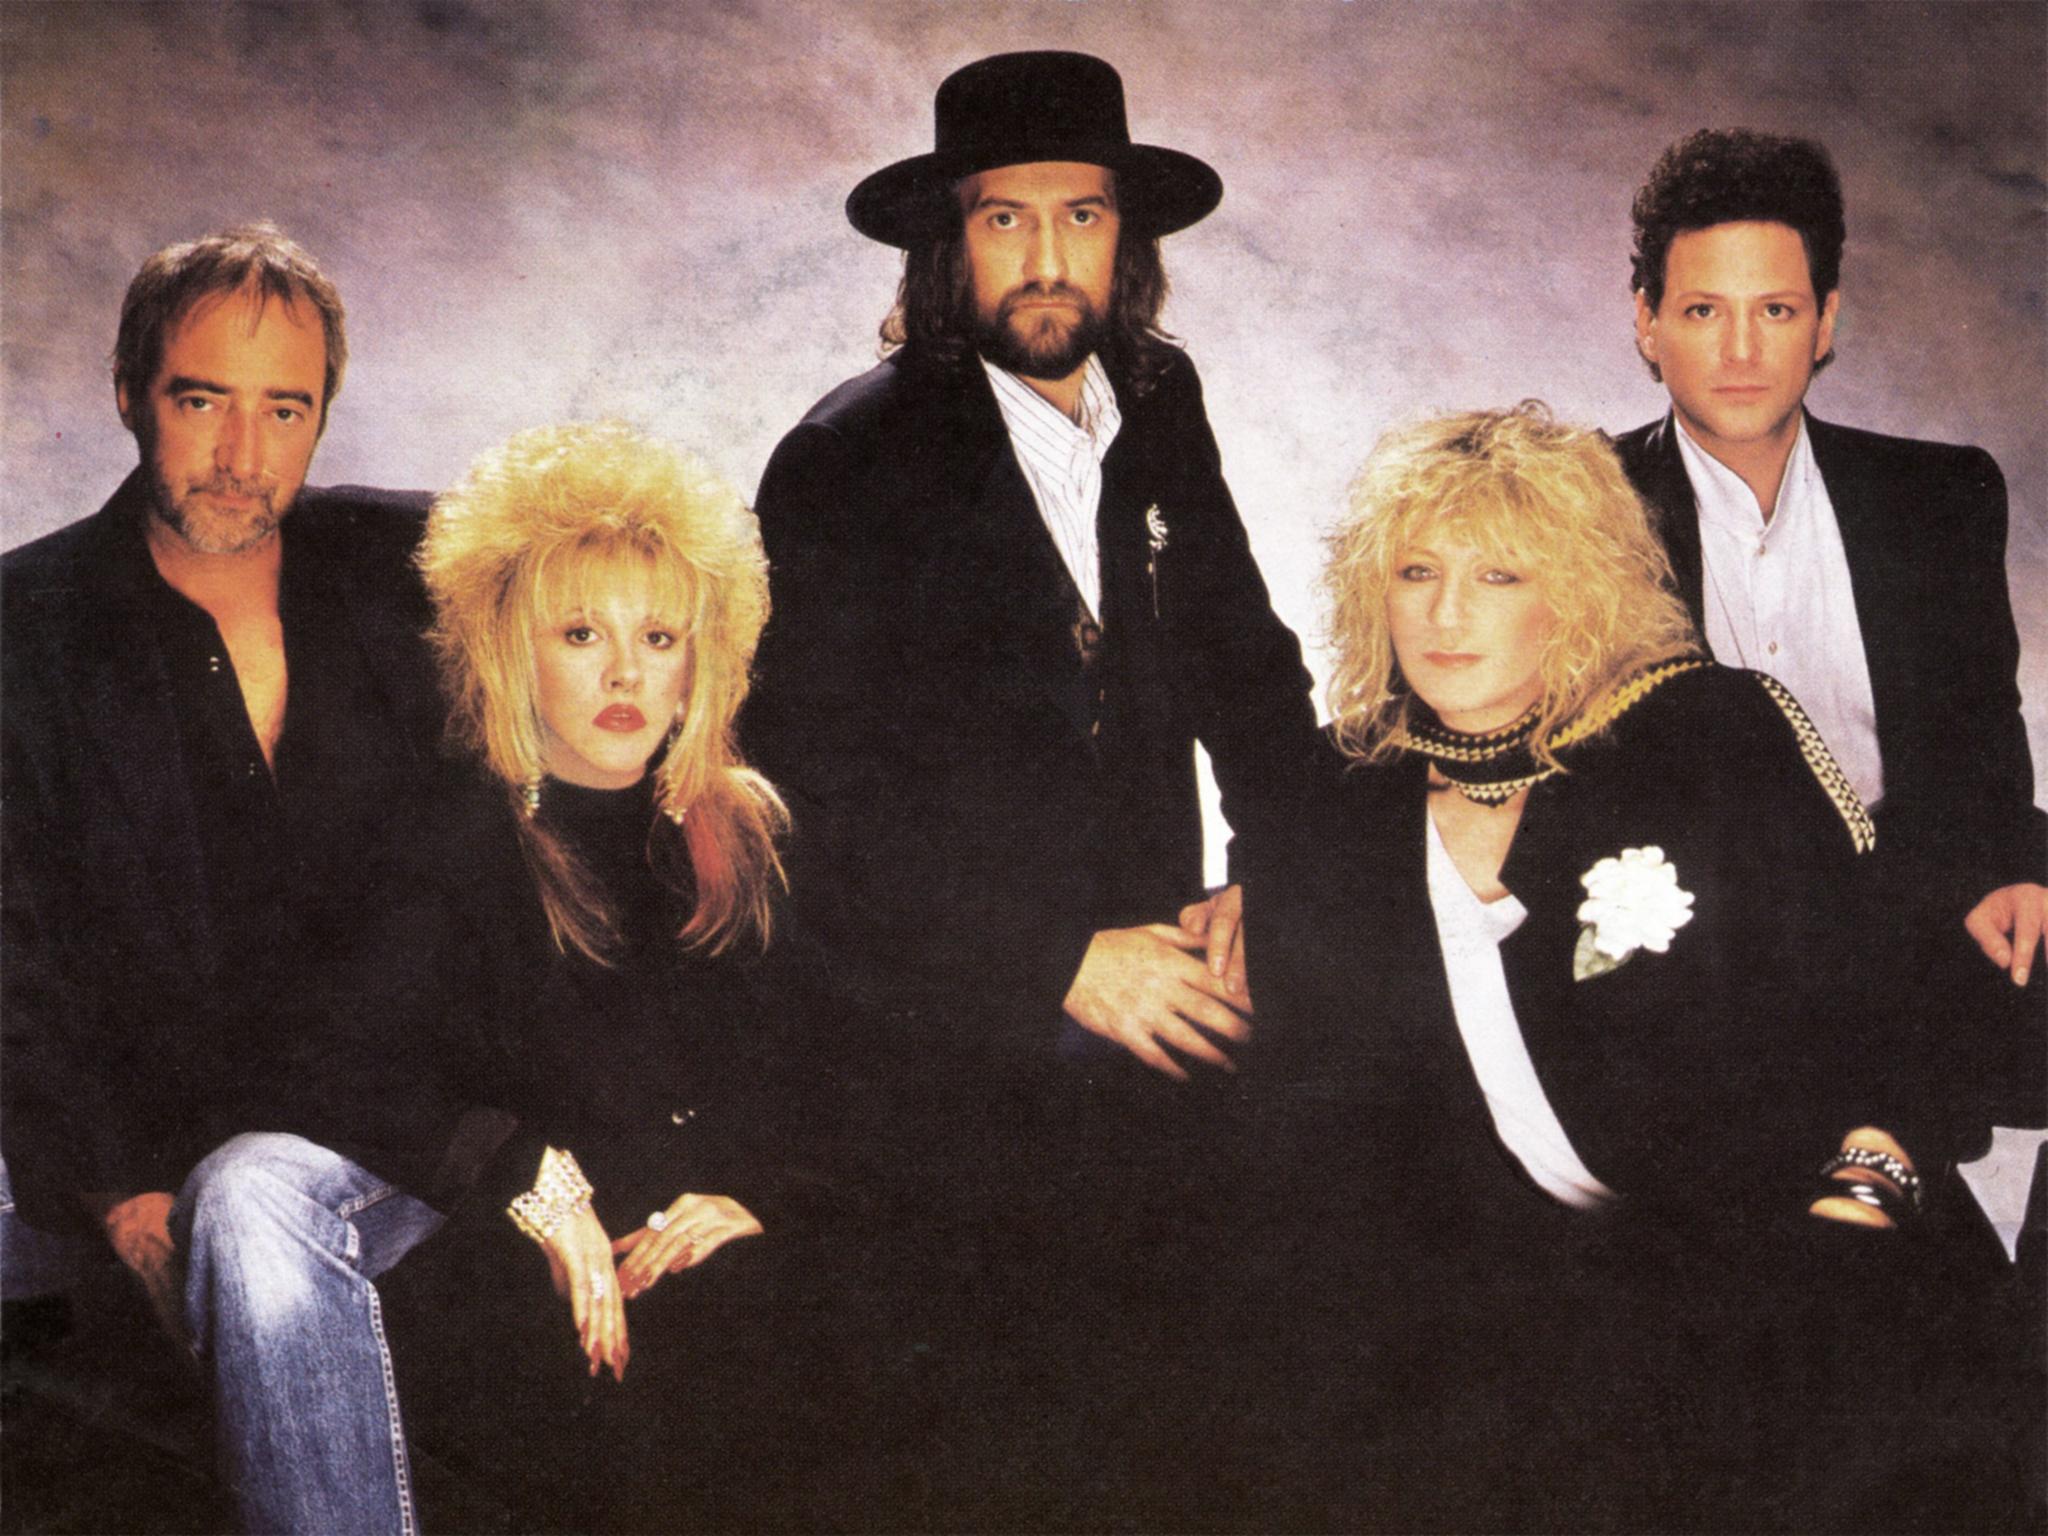 Ban photograph of Fleetwood Mac